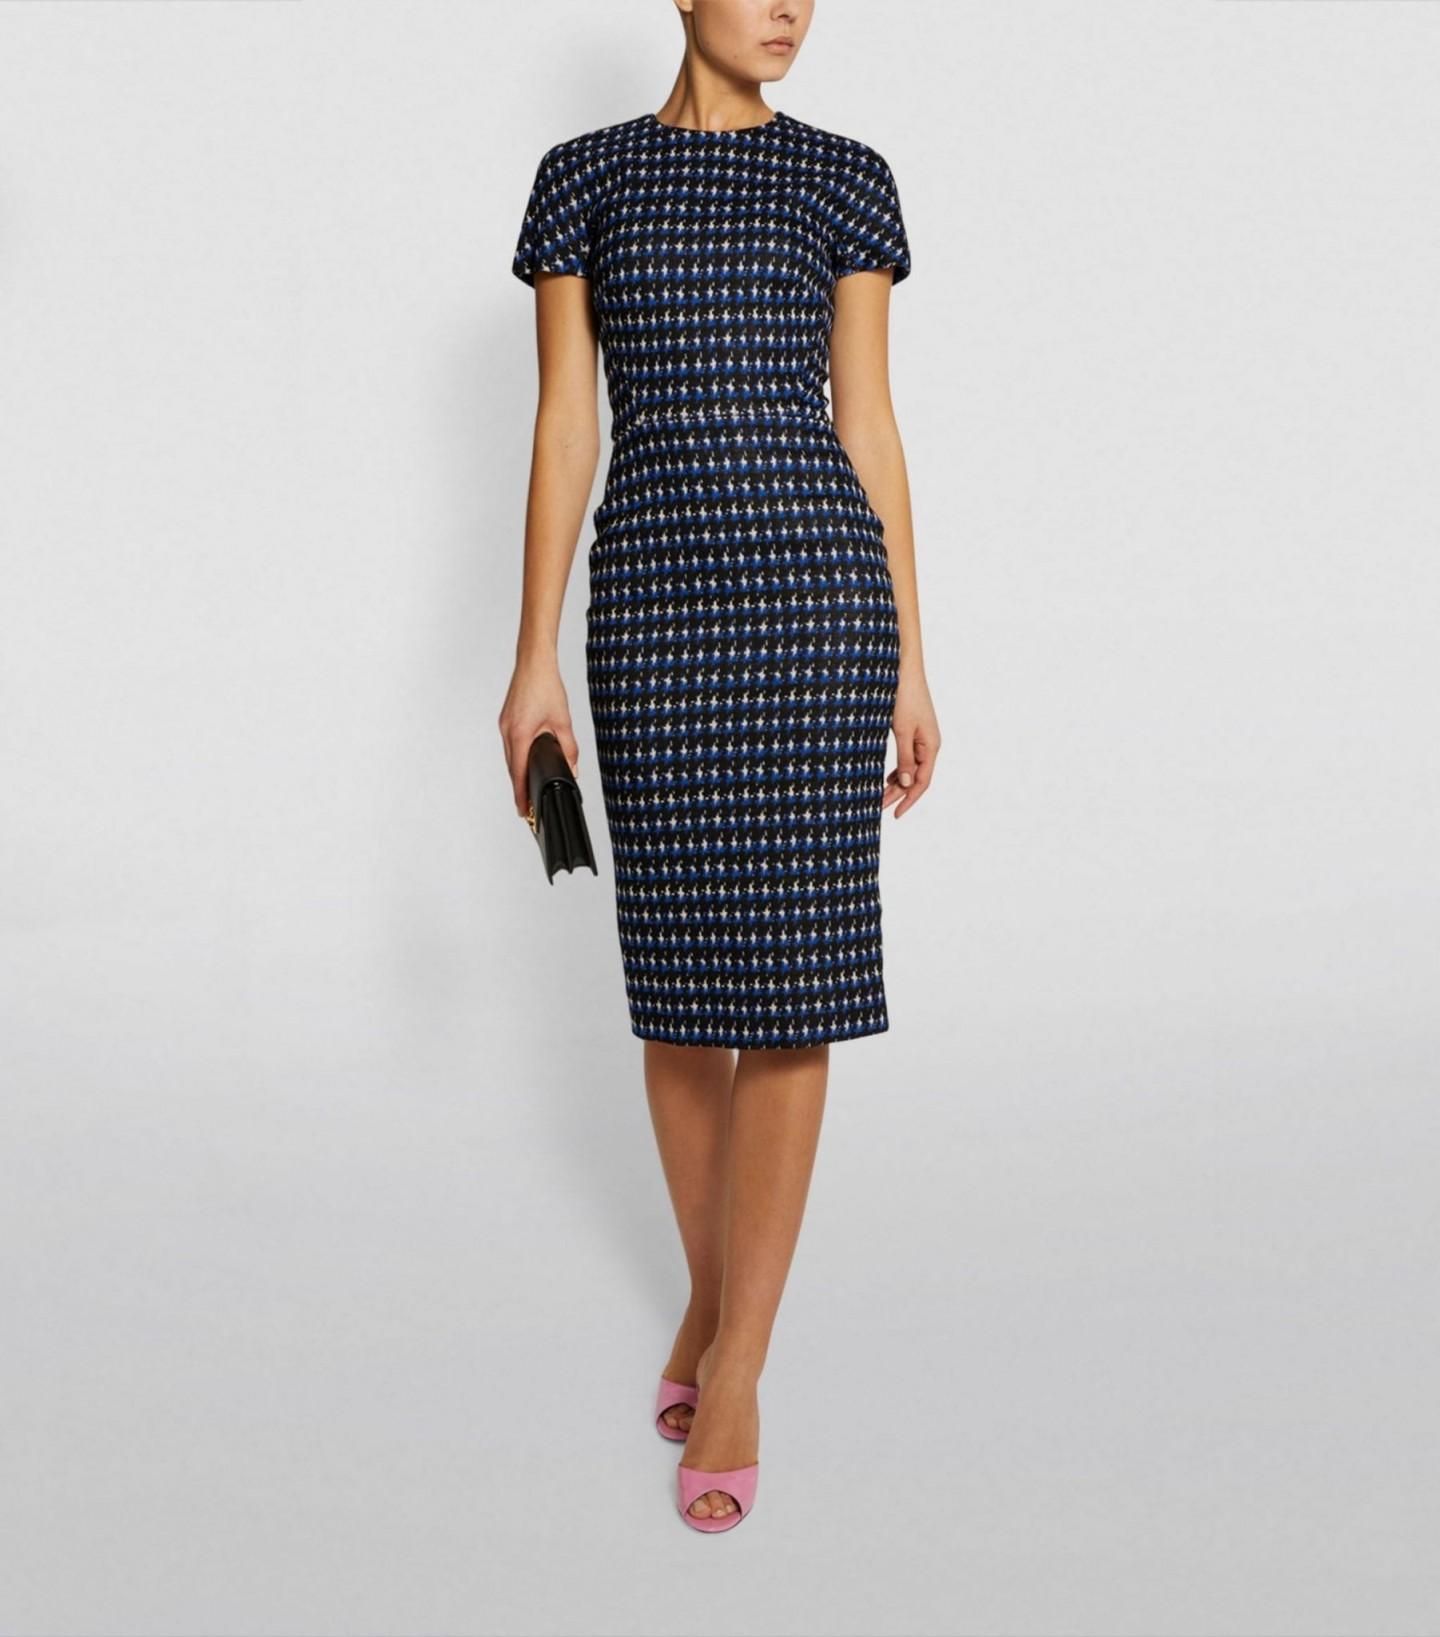 VICTORIA BECKHAM Patterned Midi Dress